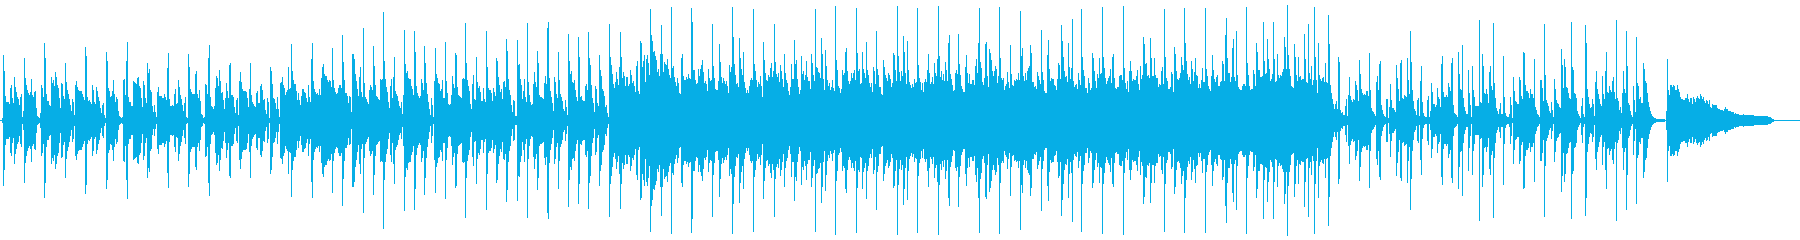 CM用8、楽しい口笛&ウクレレ・ロックBの再生済みの波形